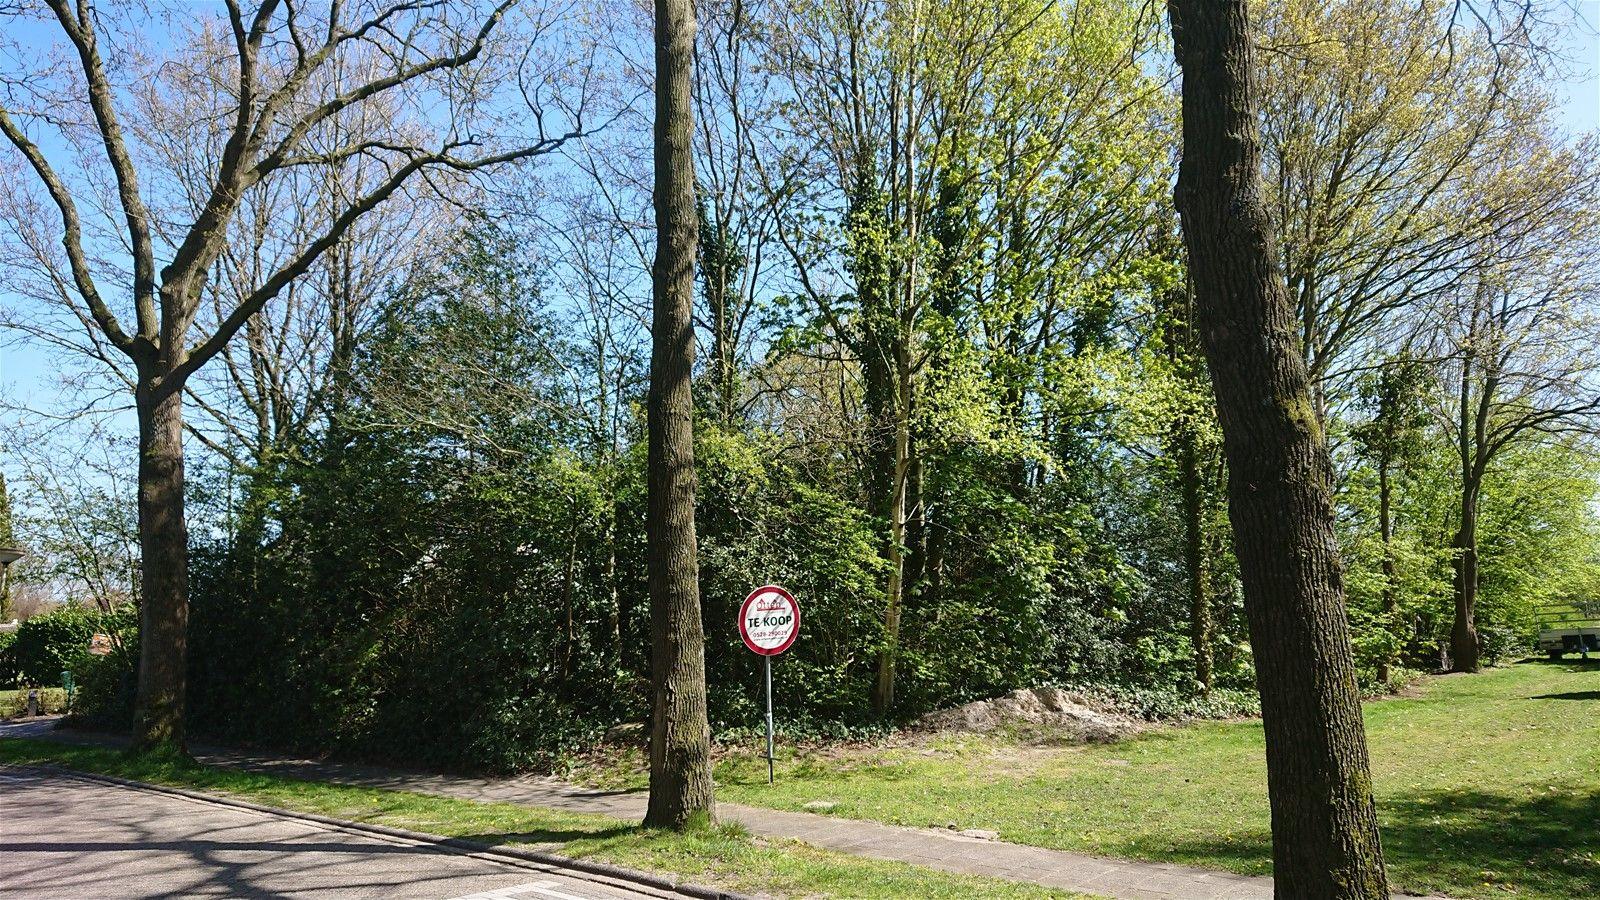 Fluitenbergseweg 0ong, Fluitenberg